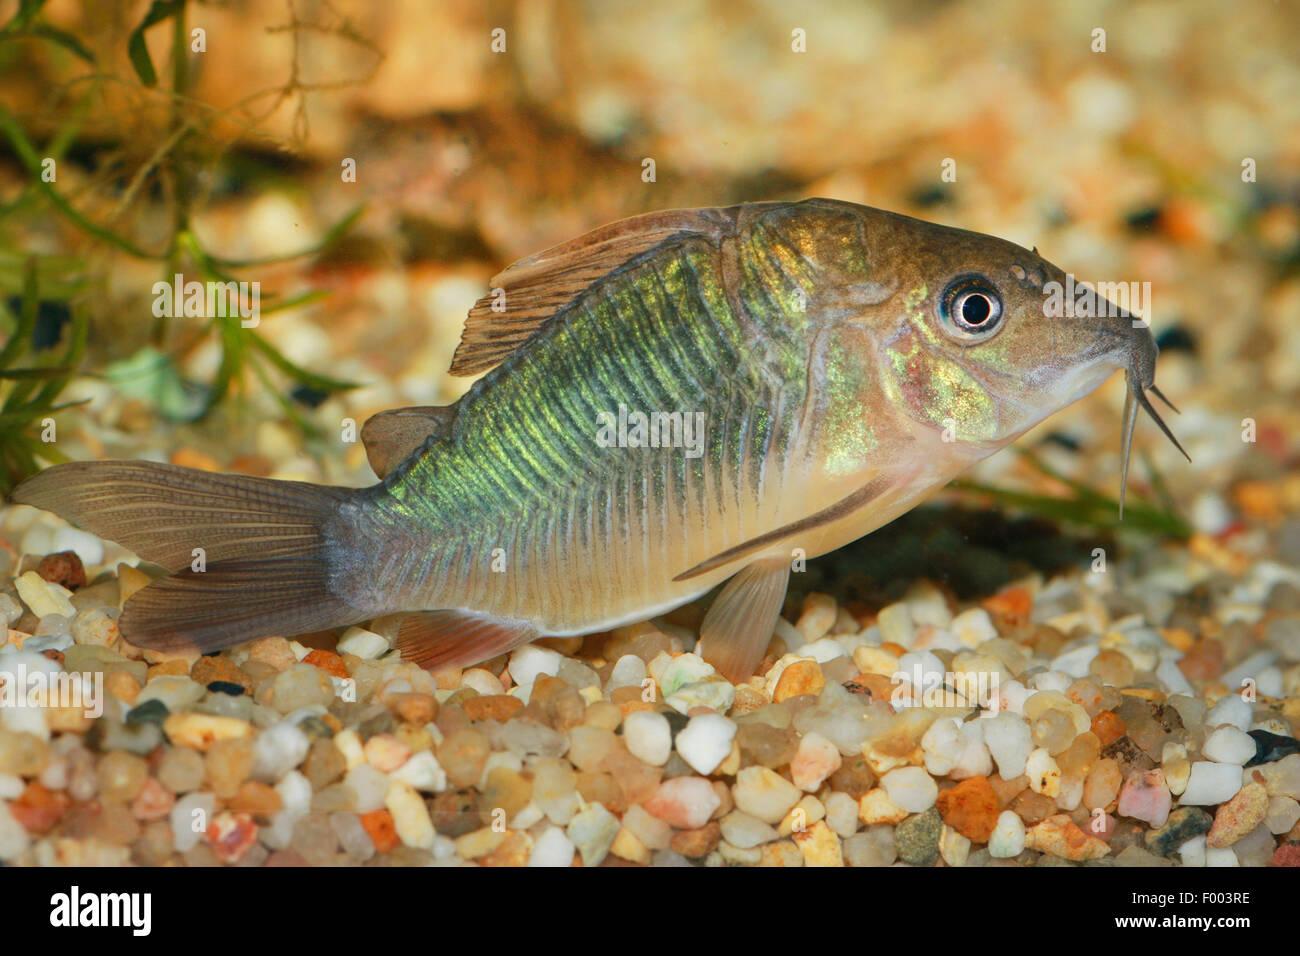 Aeneus catfish, Bronze Corydoras (Corydoras aeneus), swimming - Stock Image